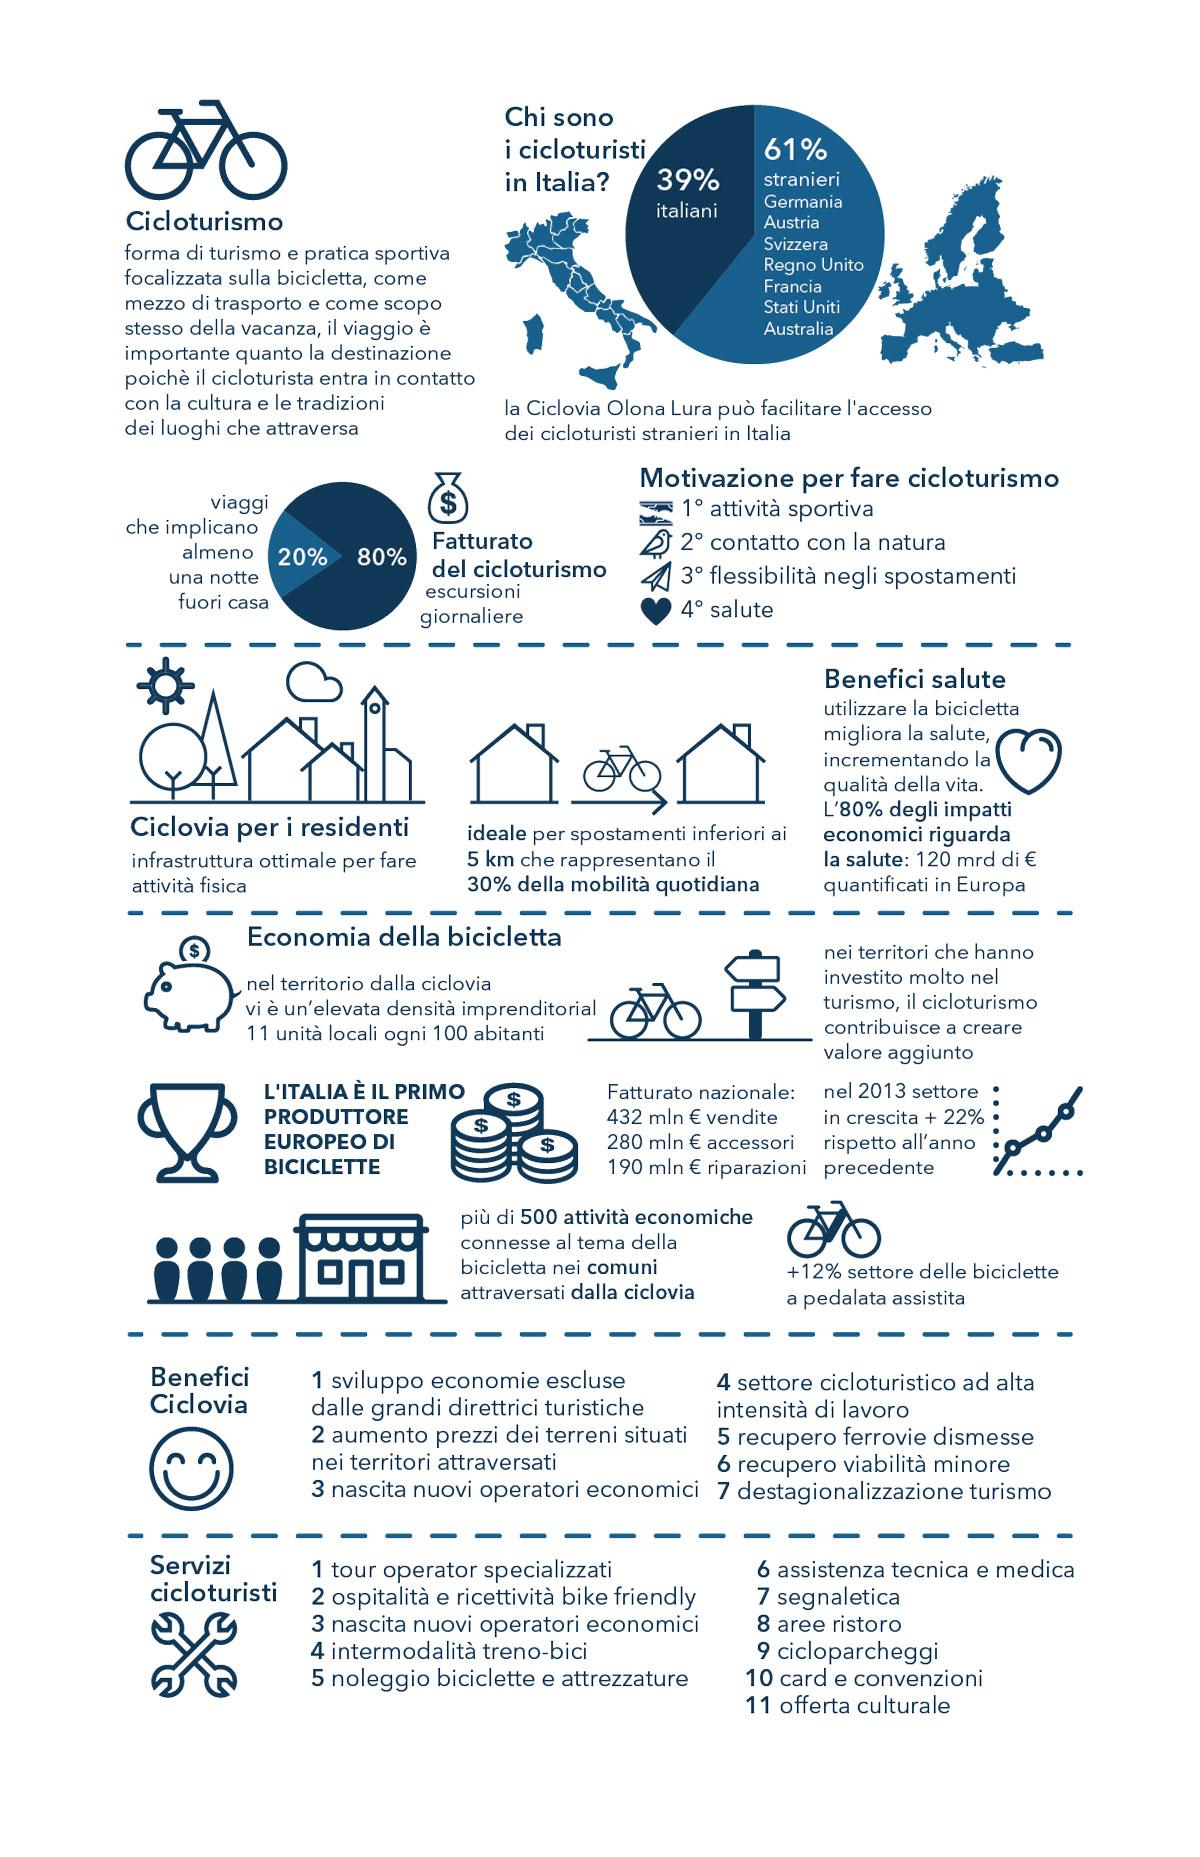 Sintesi delle principali evidenze relative al cicloturismo